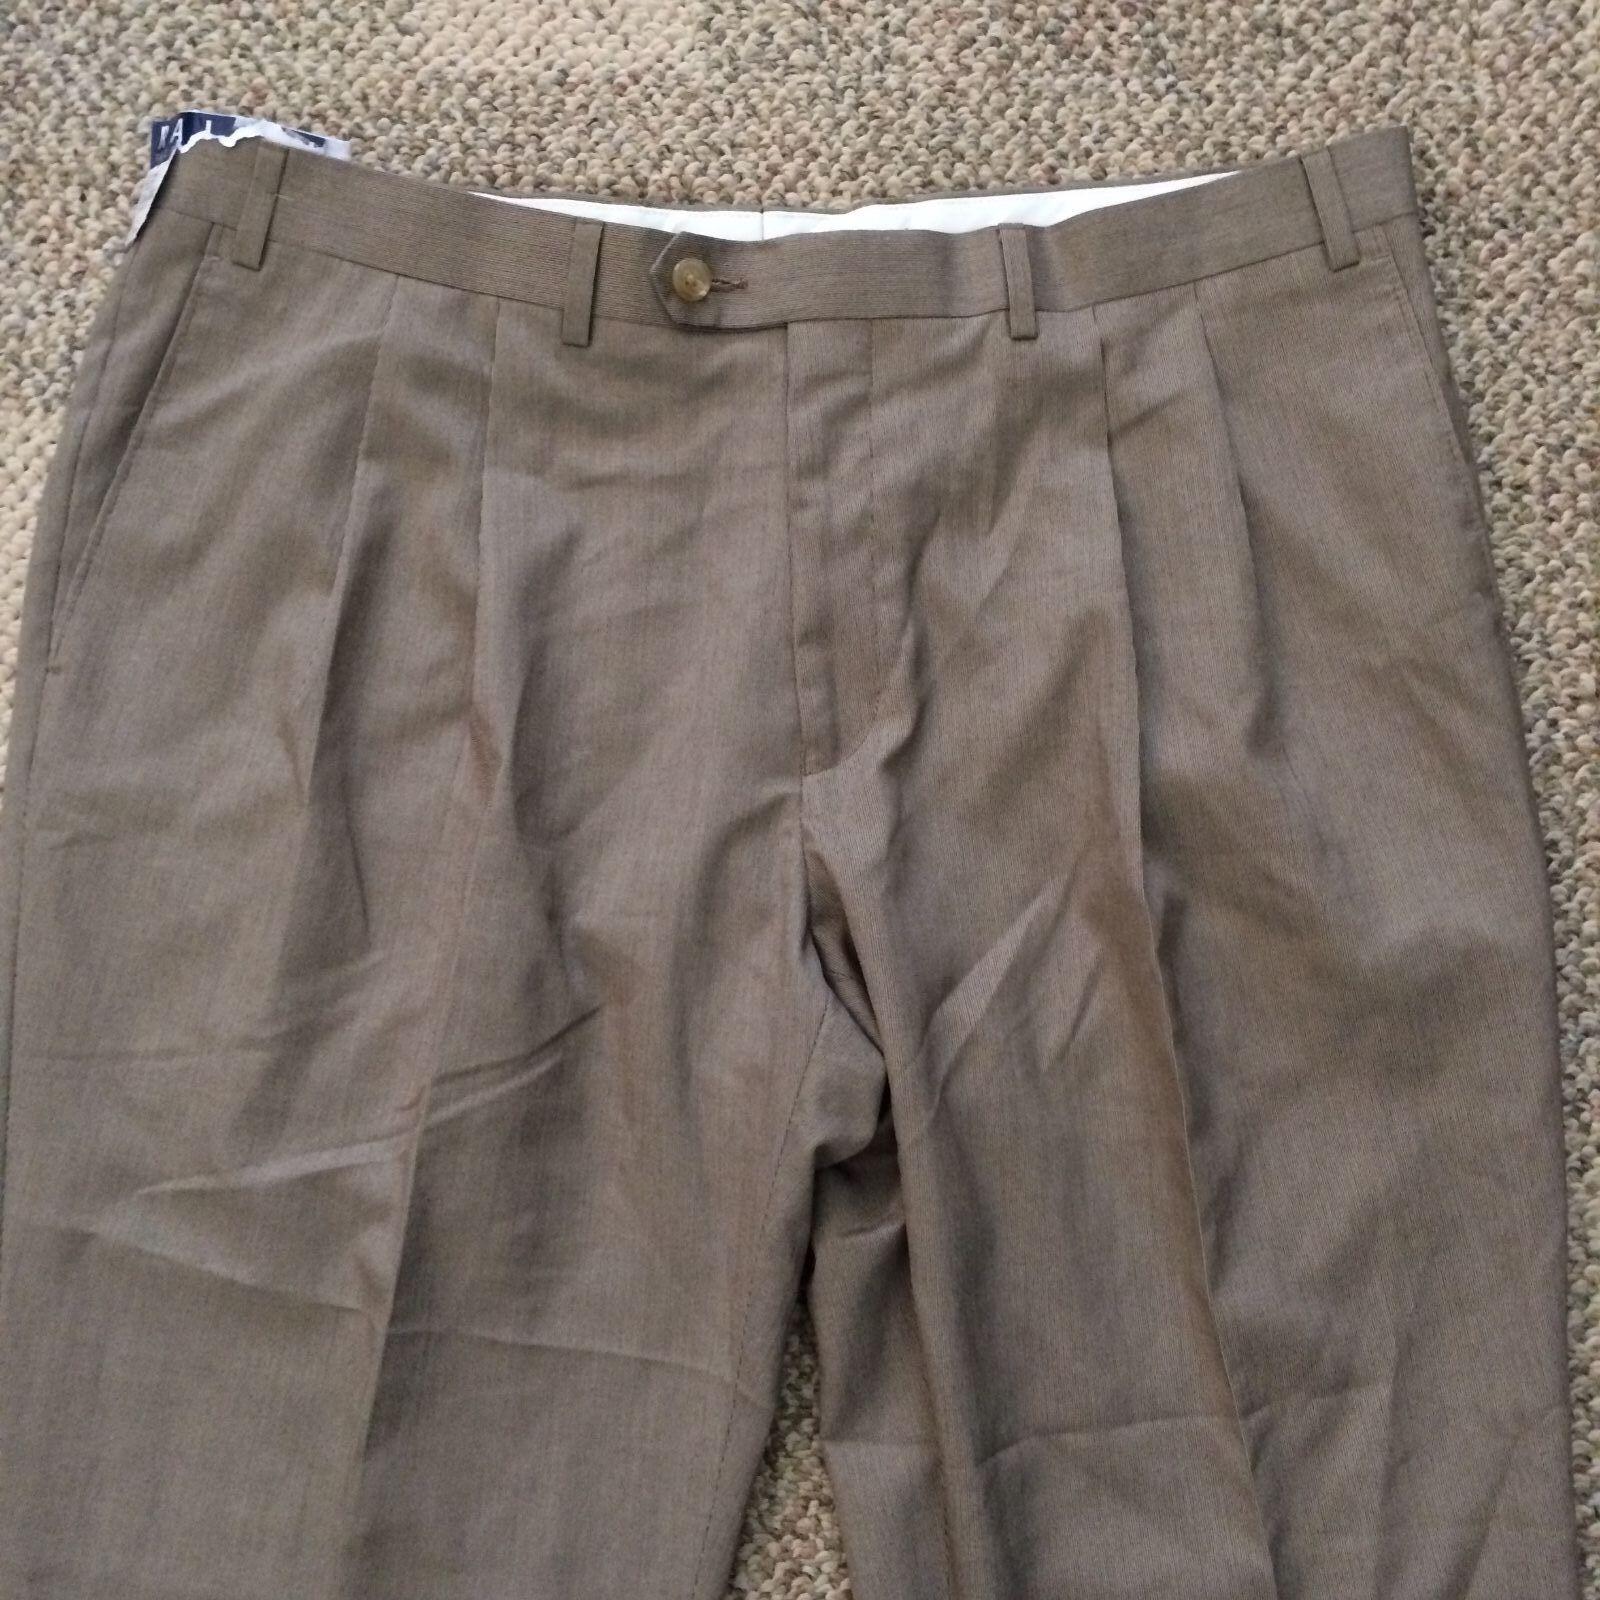 Size 38 X 30 Ralph Lauren Mens Men's Pleated Cuffed Dress Pants Brown Modern Fit